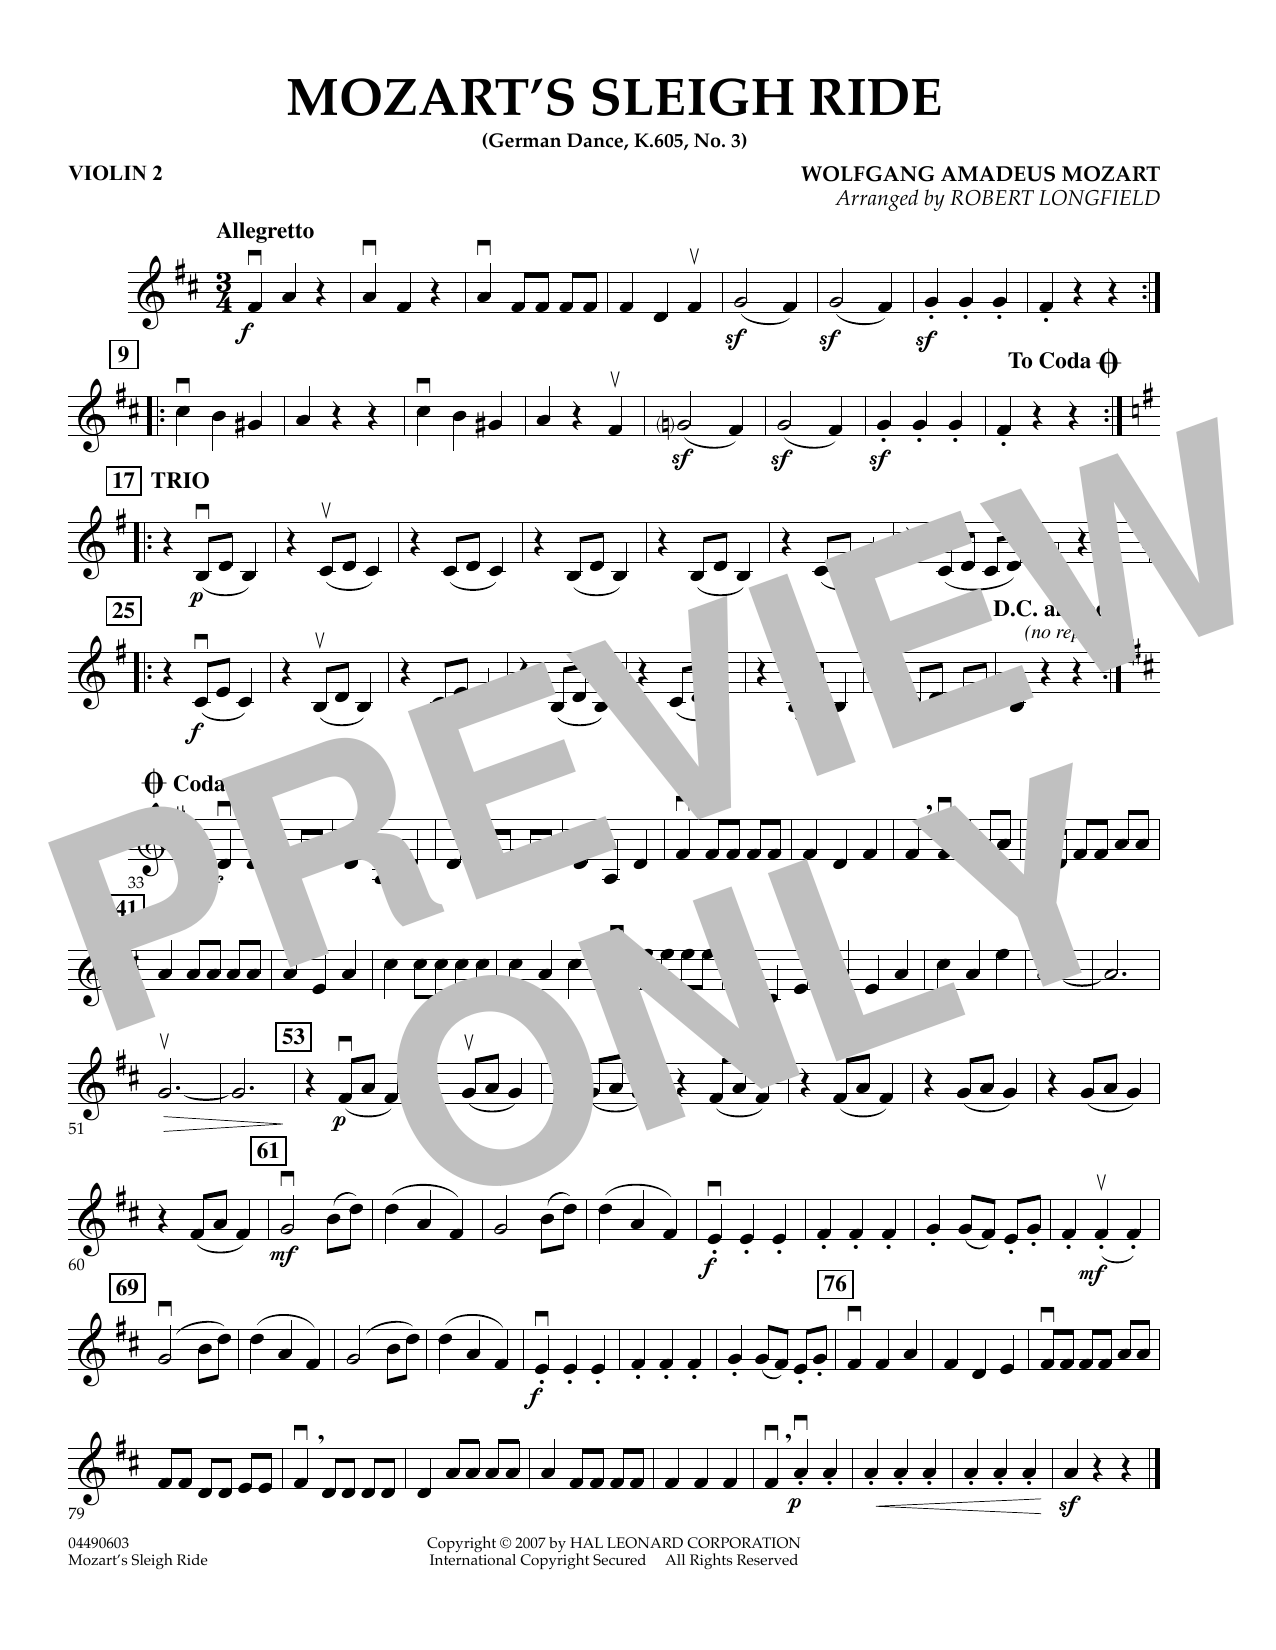 Mozart's Sleigh Ride (German Dance, K.605, No.3) - Violin 2 (Orchestra)